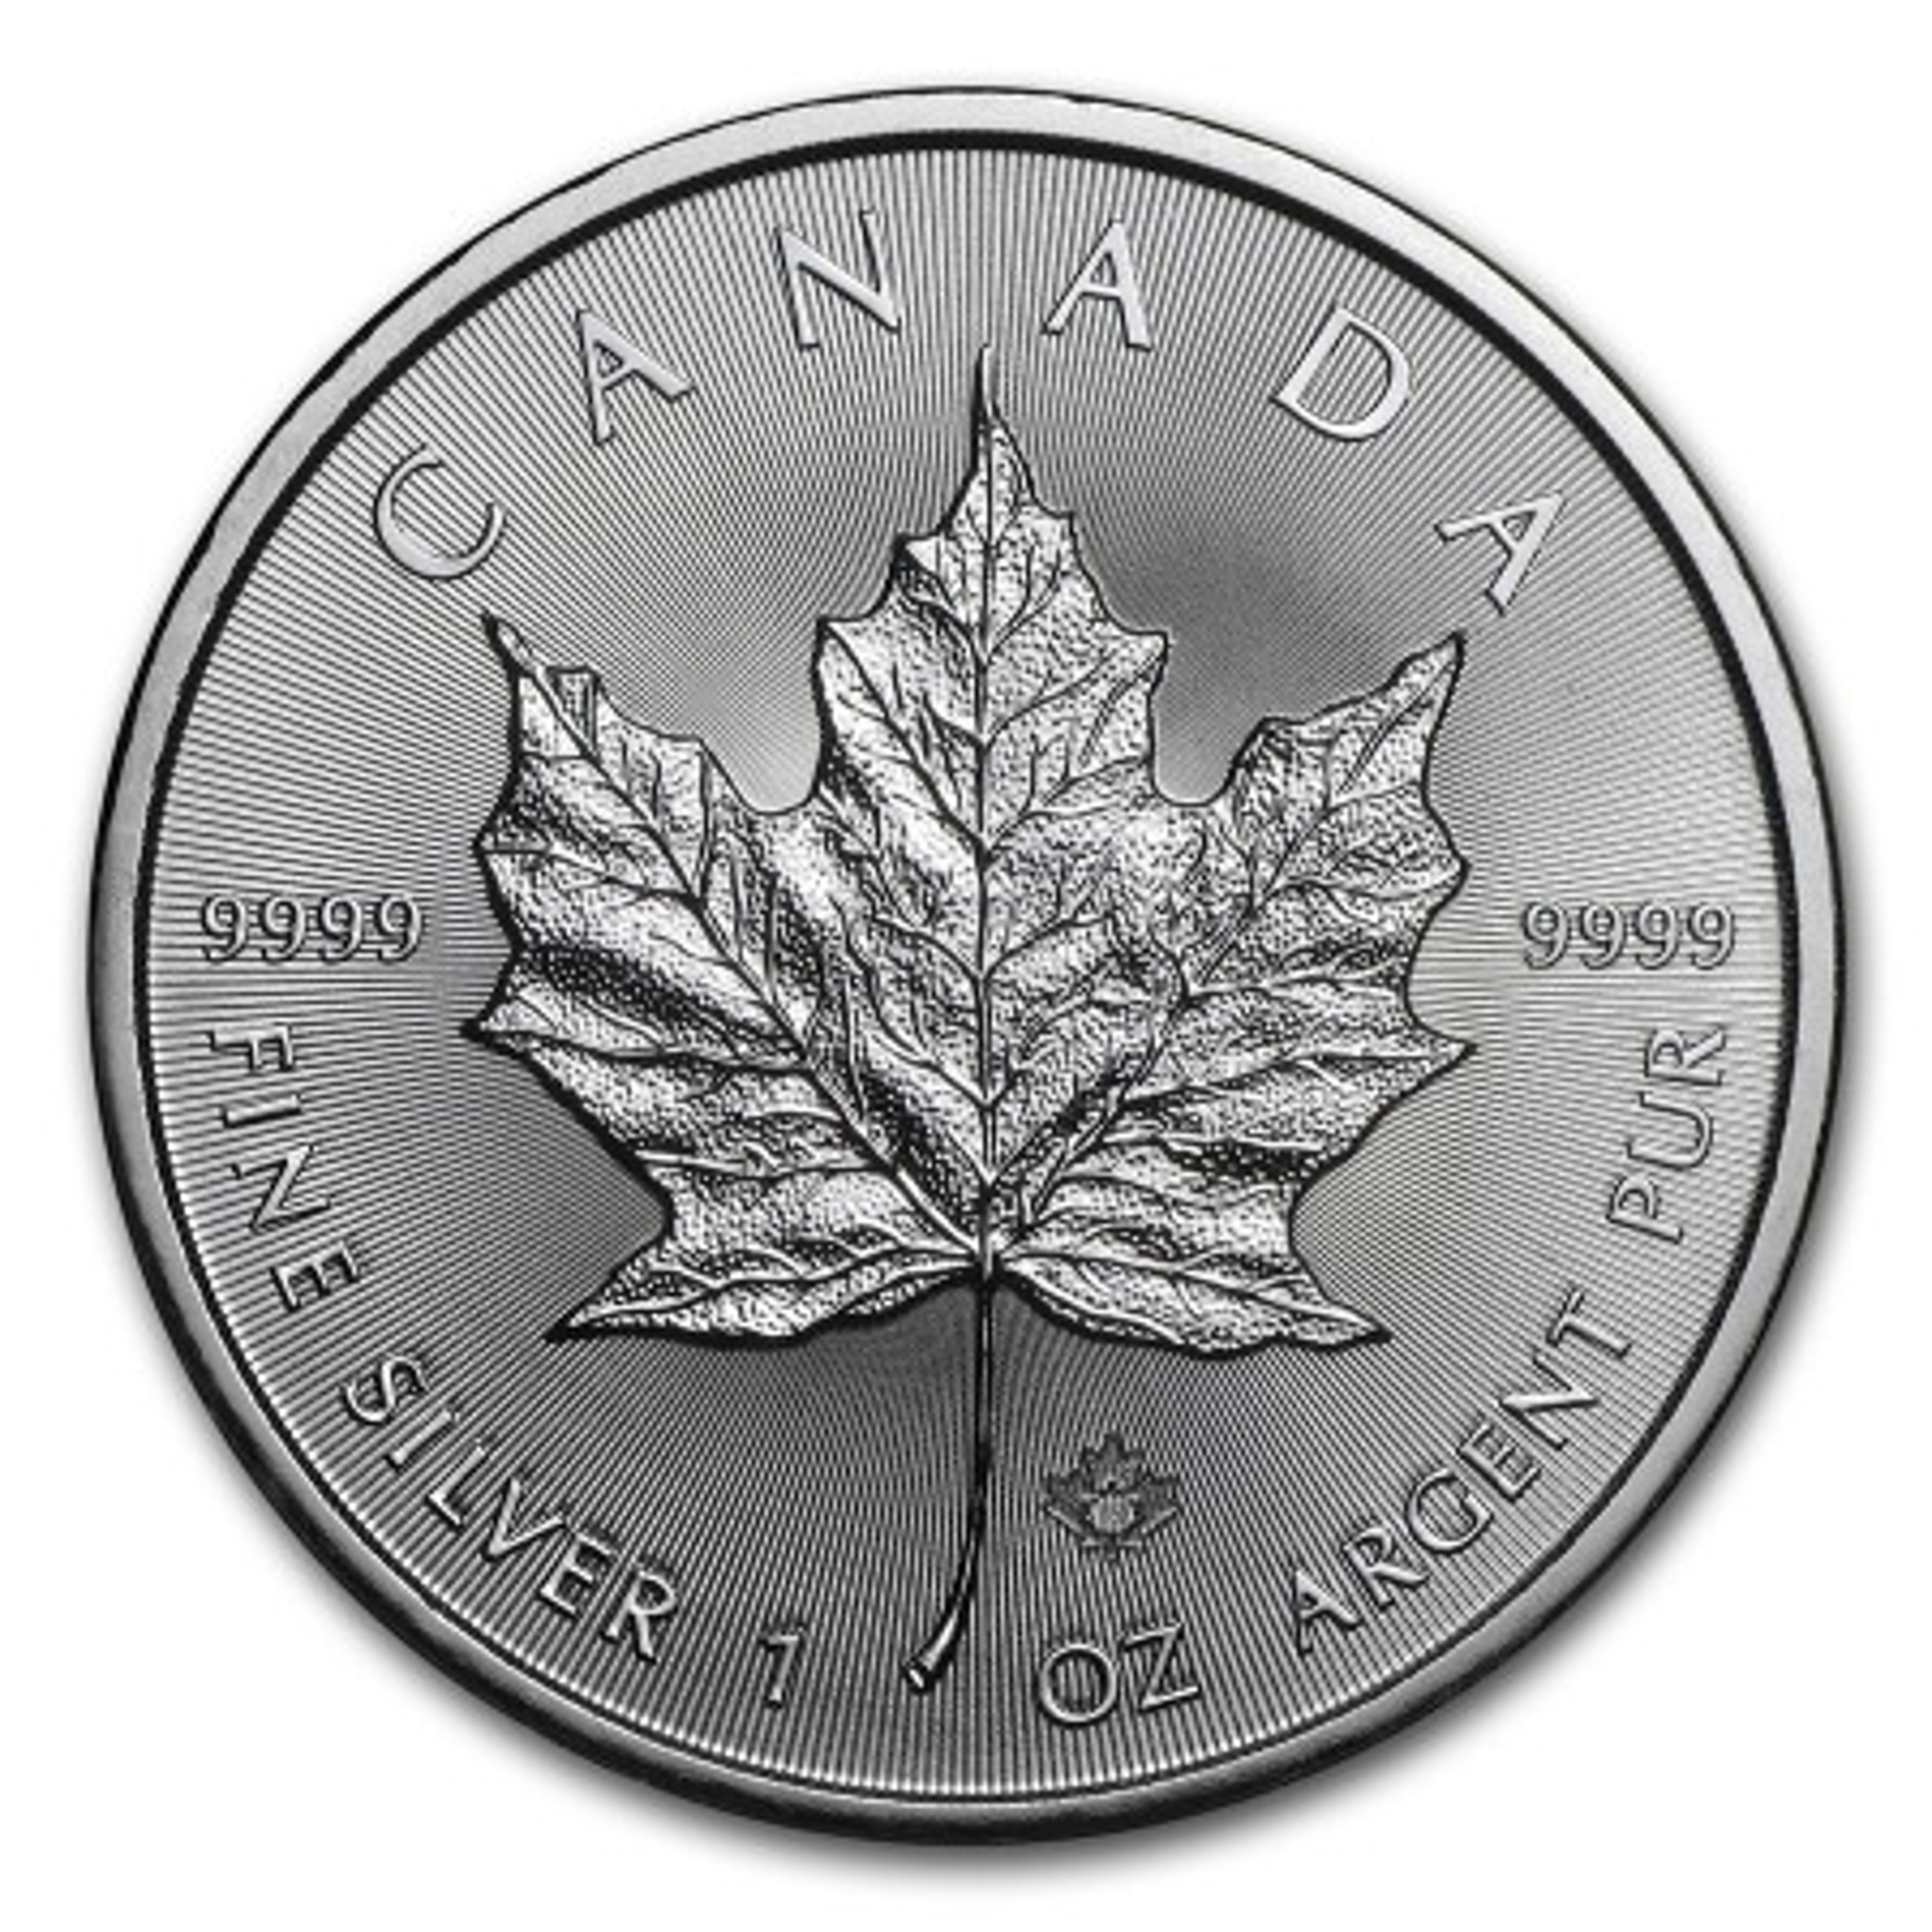 1 Troy ounce zilveren Maple Leaf munt 2019